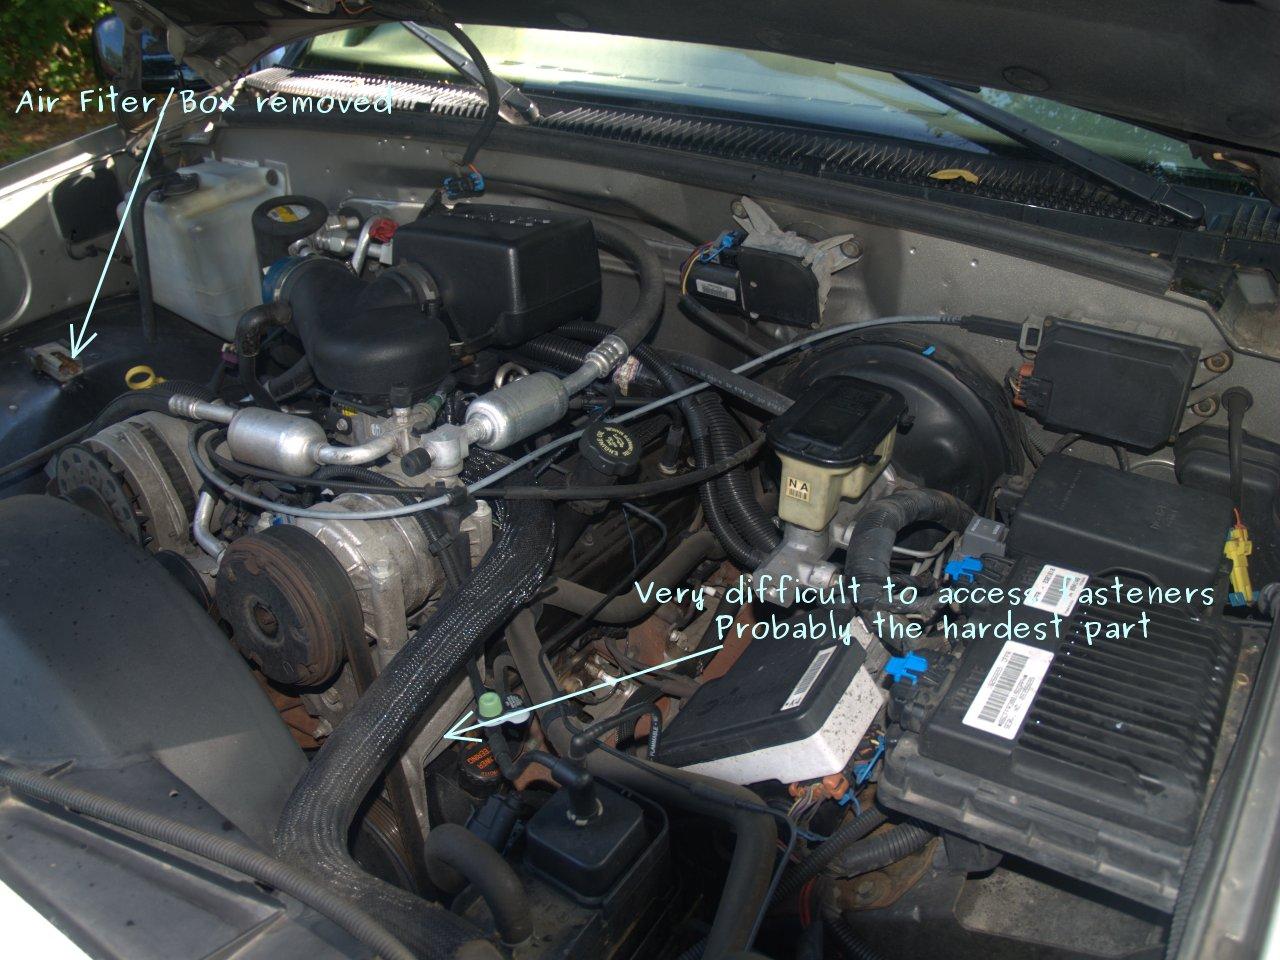 x18 pocket bike wiring diagram central heating y plan engine mount bolt free image for user